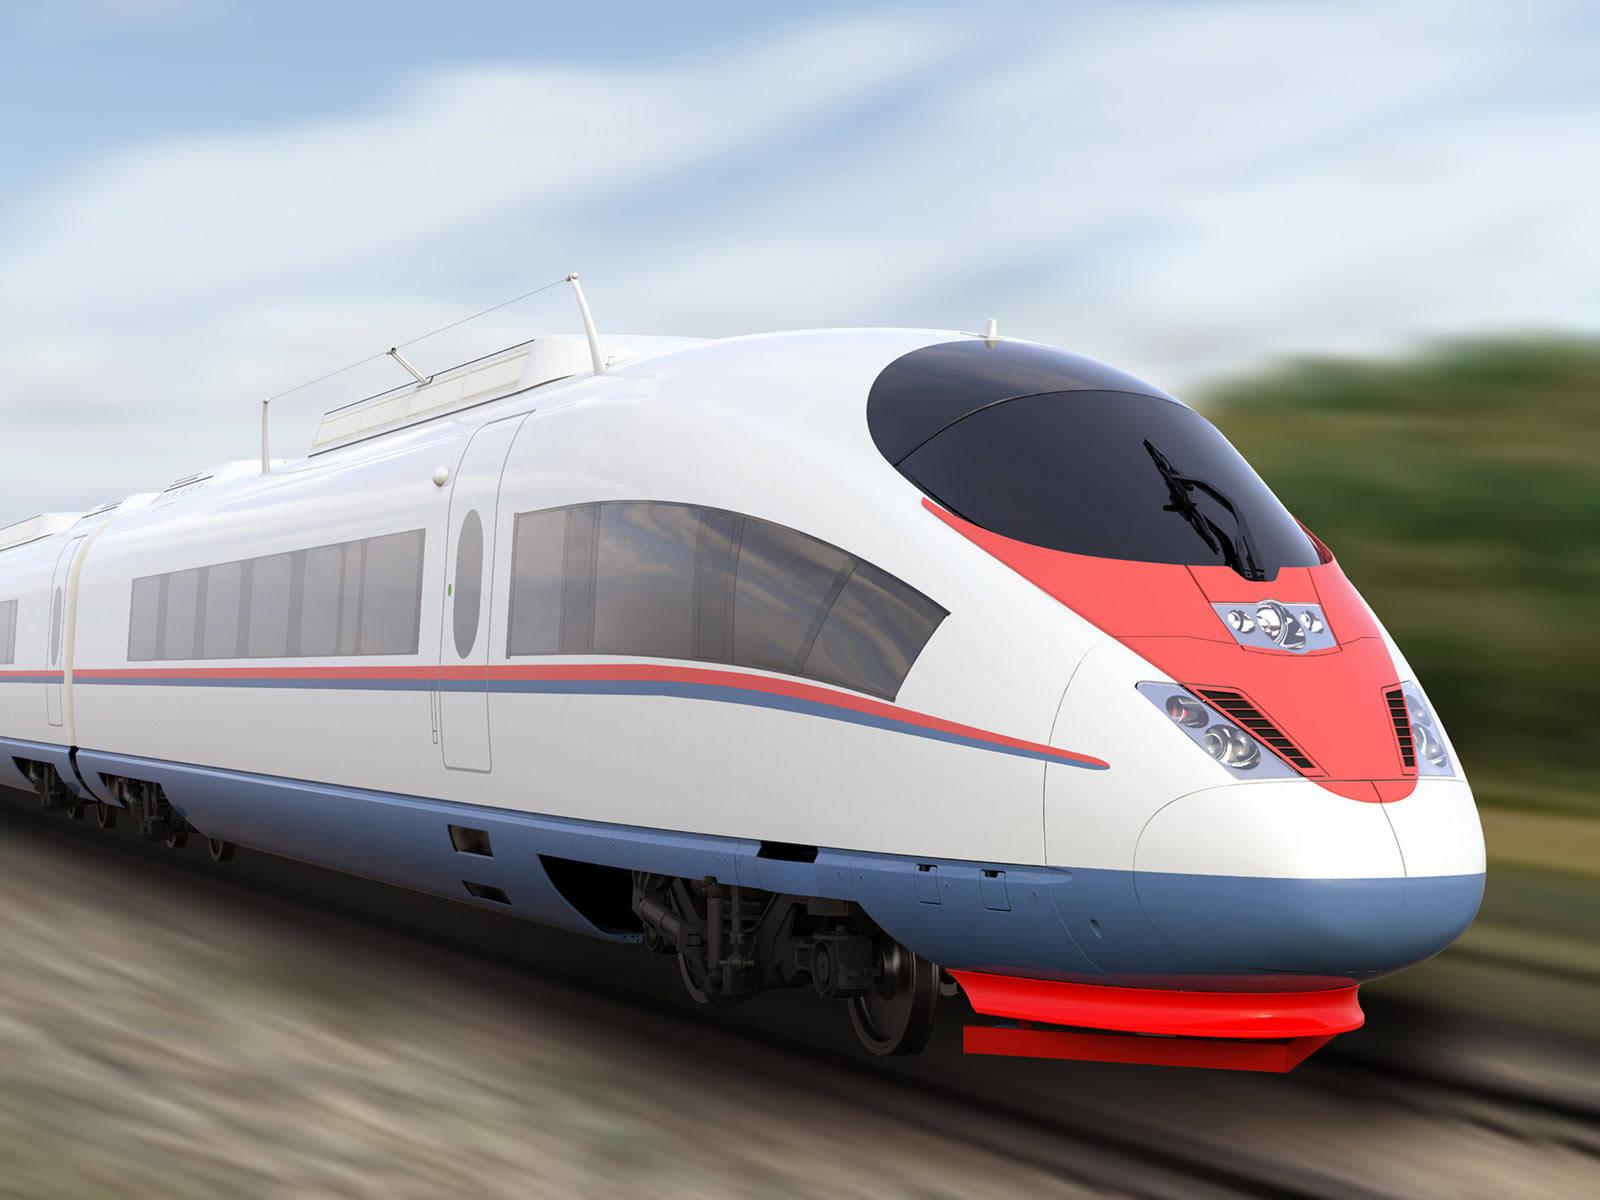 Поезд Москва - Петербург, поезд Петербург - Москва, Сапсан, купить билет онлайн